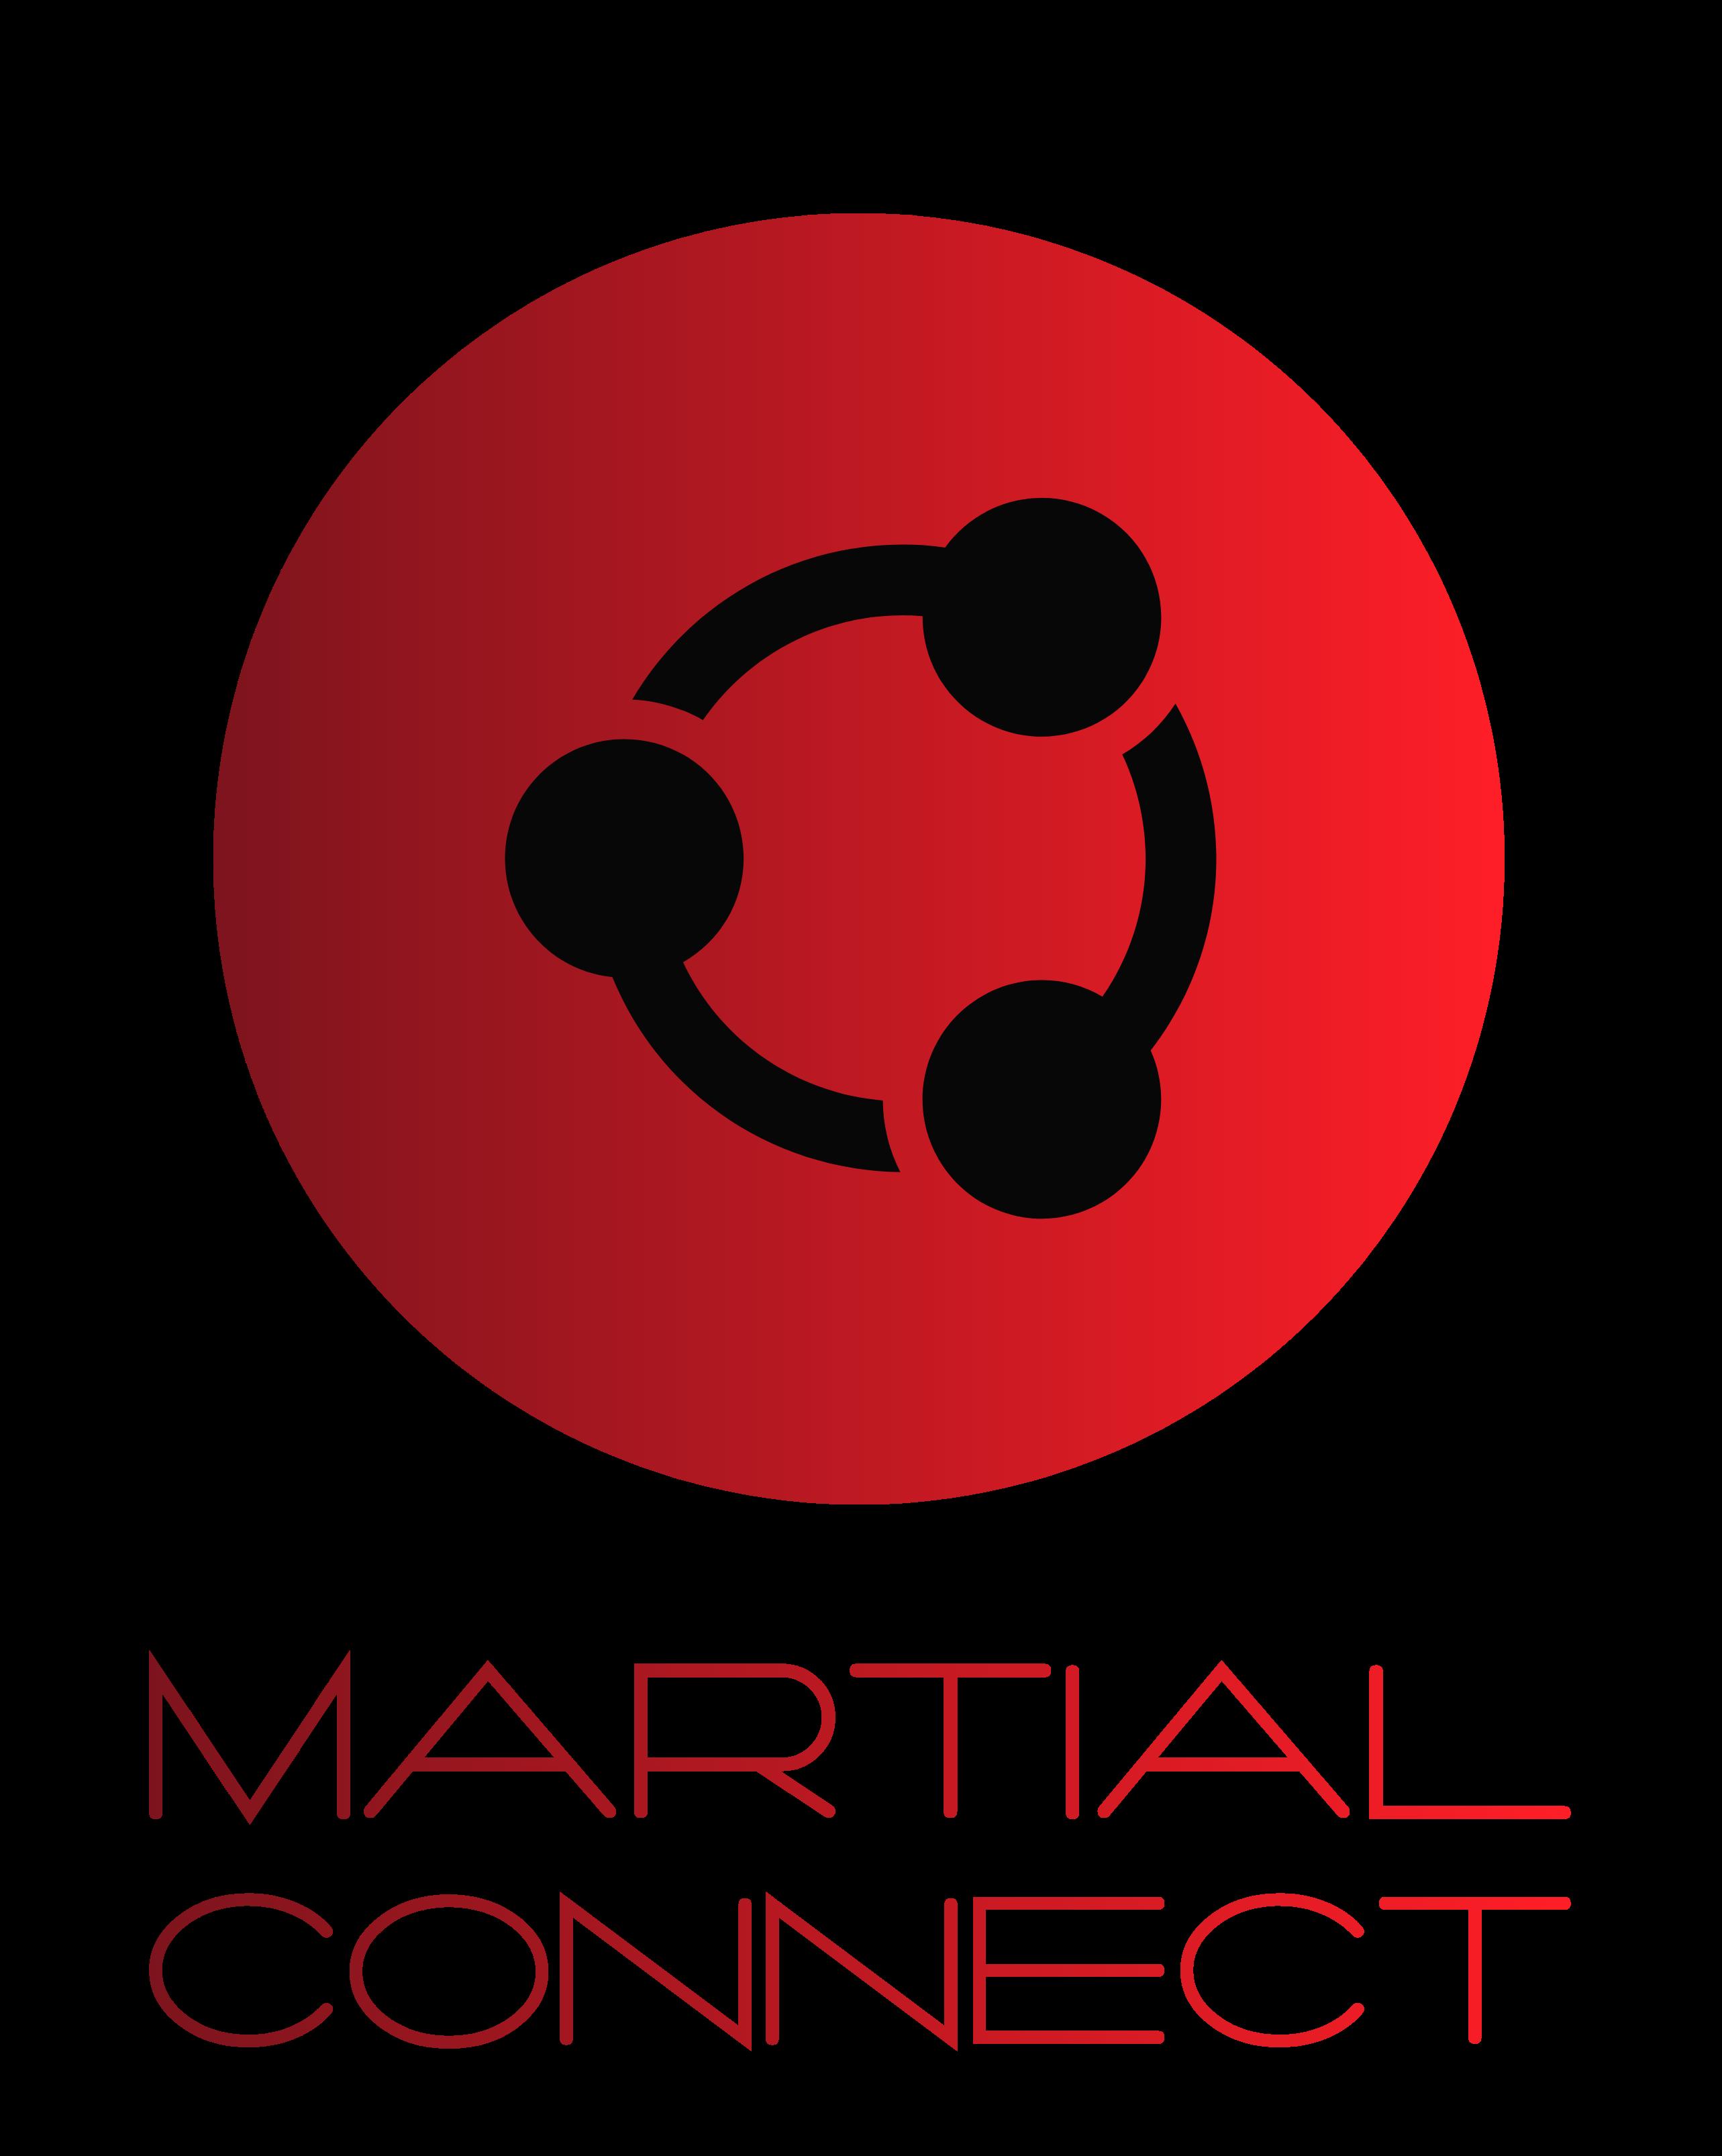 martialconnectred-b8e4a872001cc4f270867059fb22fbe184030c2e633dd8dc662ca5203089cde8 (1)